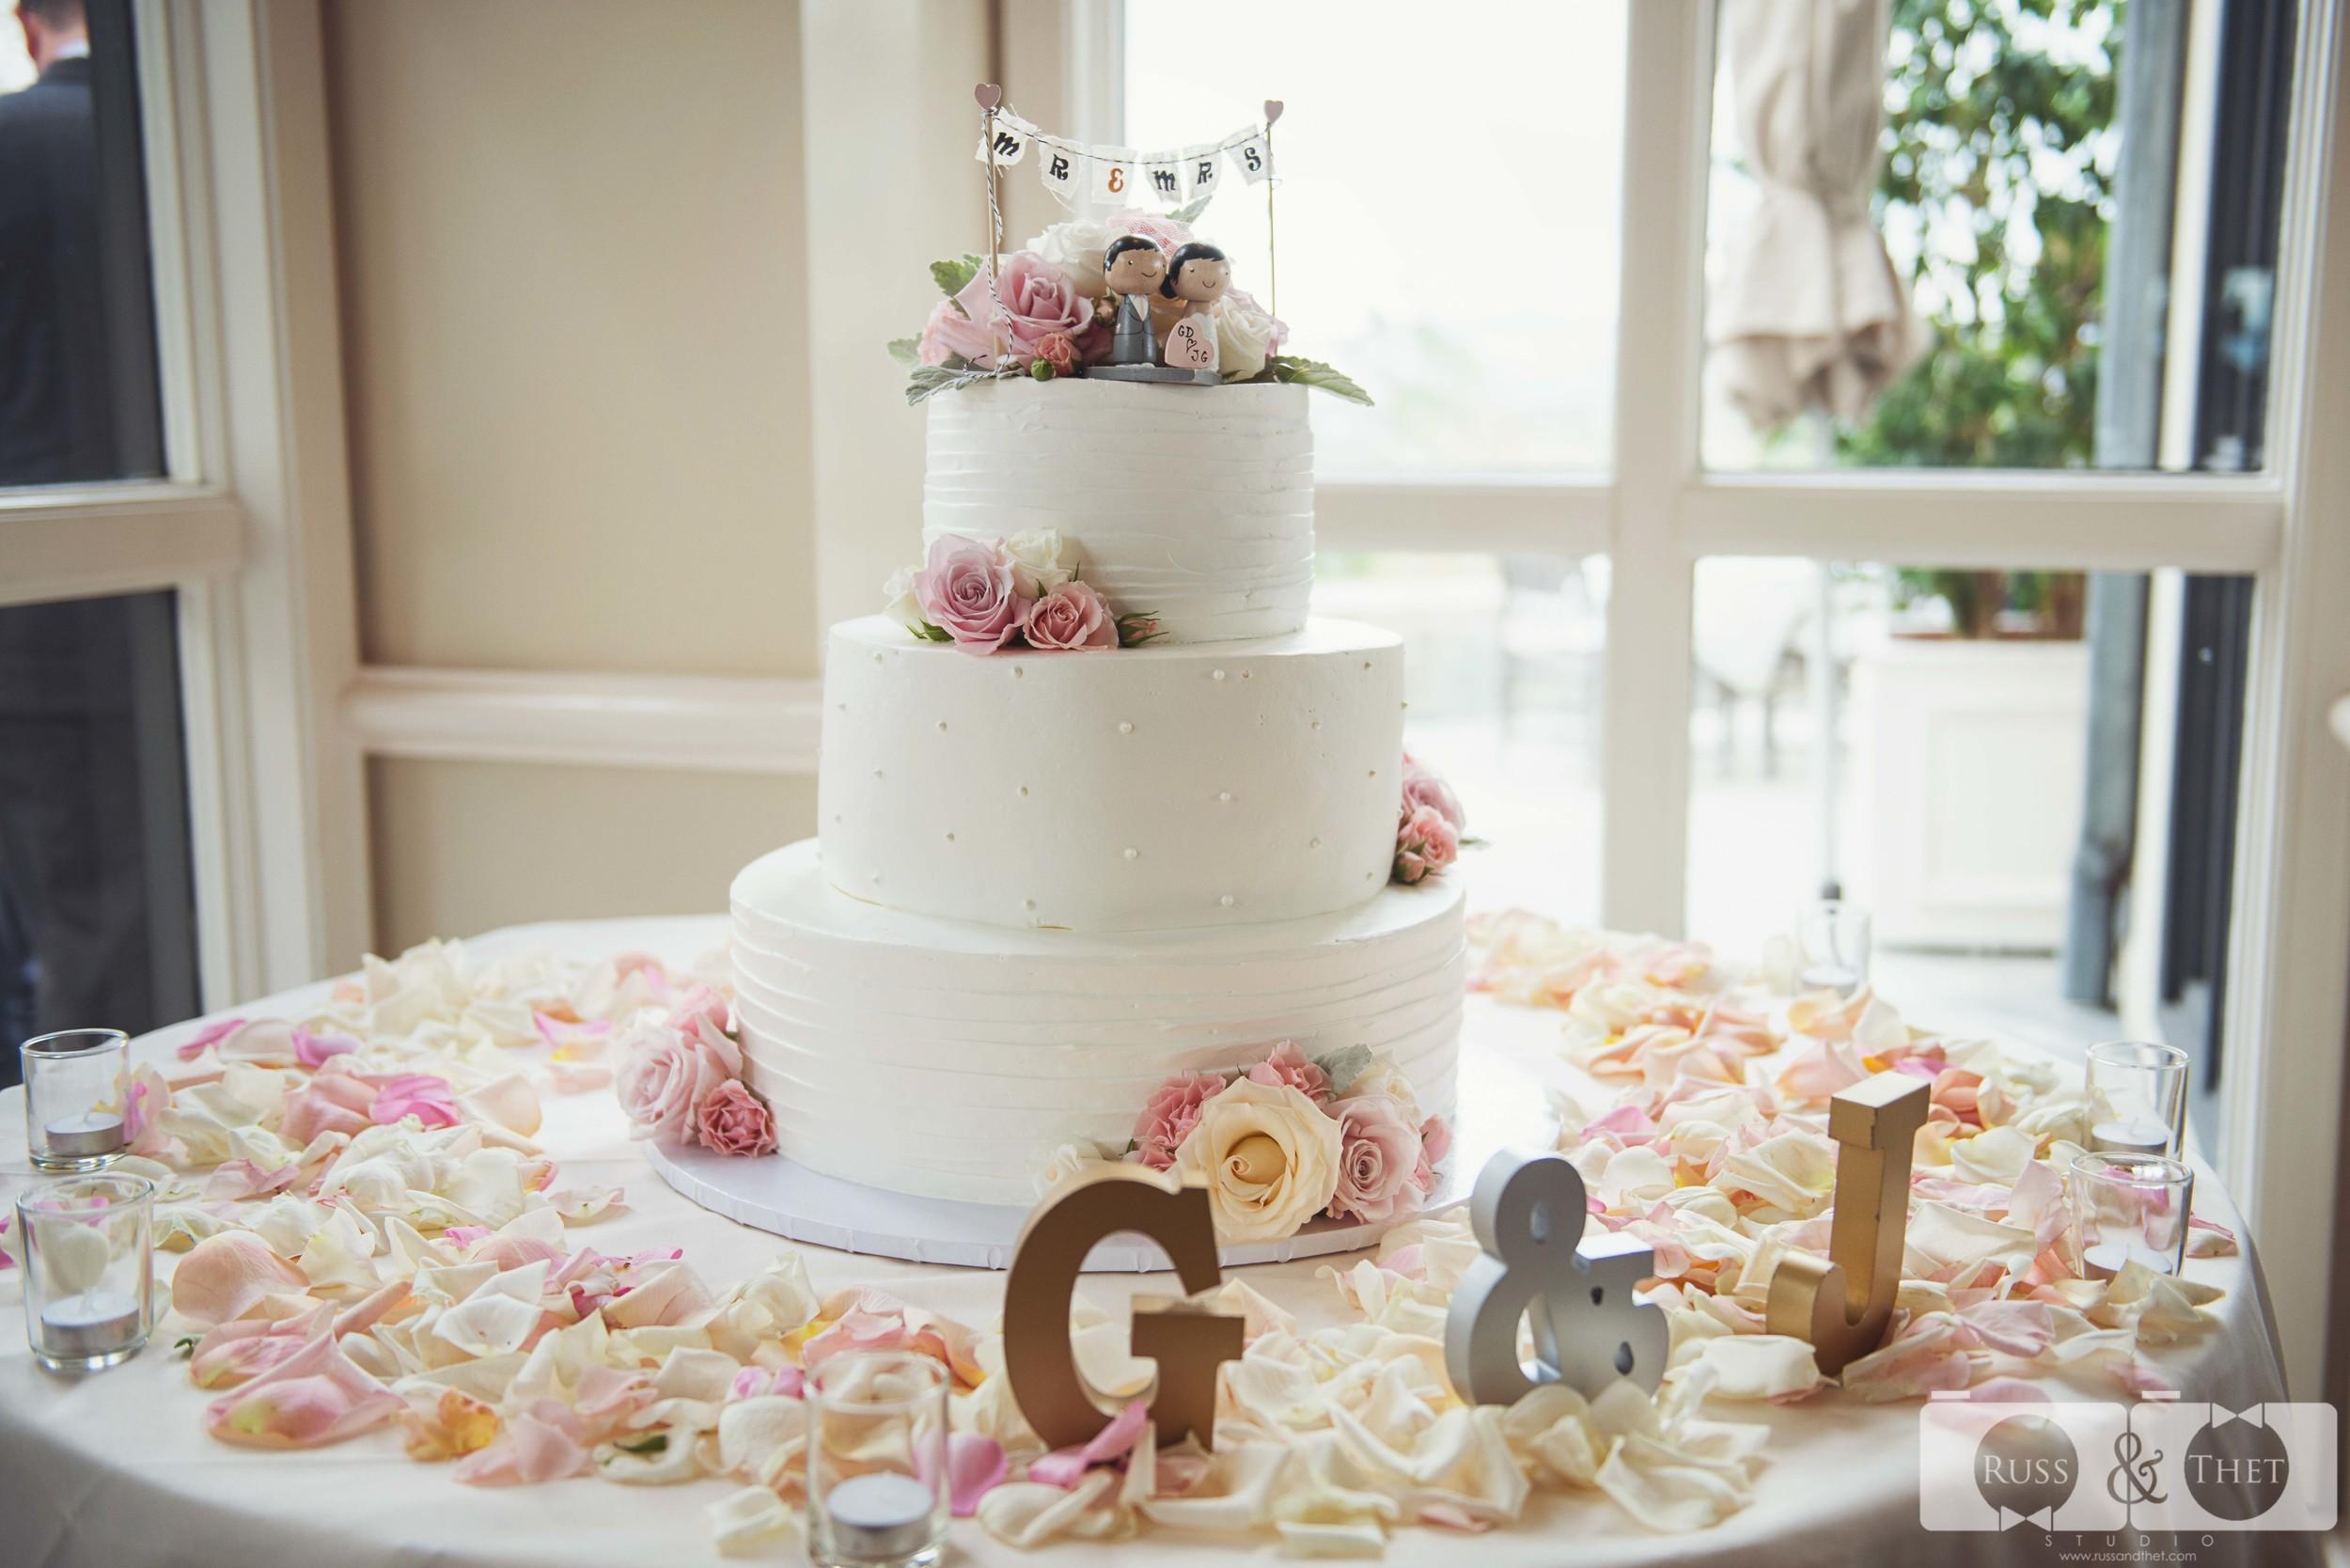 summit-house-fullerton-wedding-photographer-70.JPG